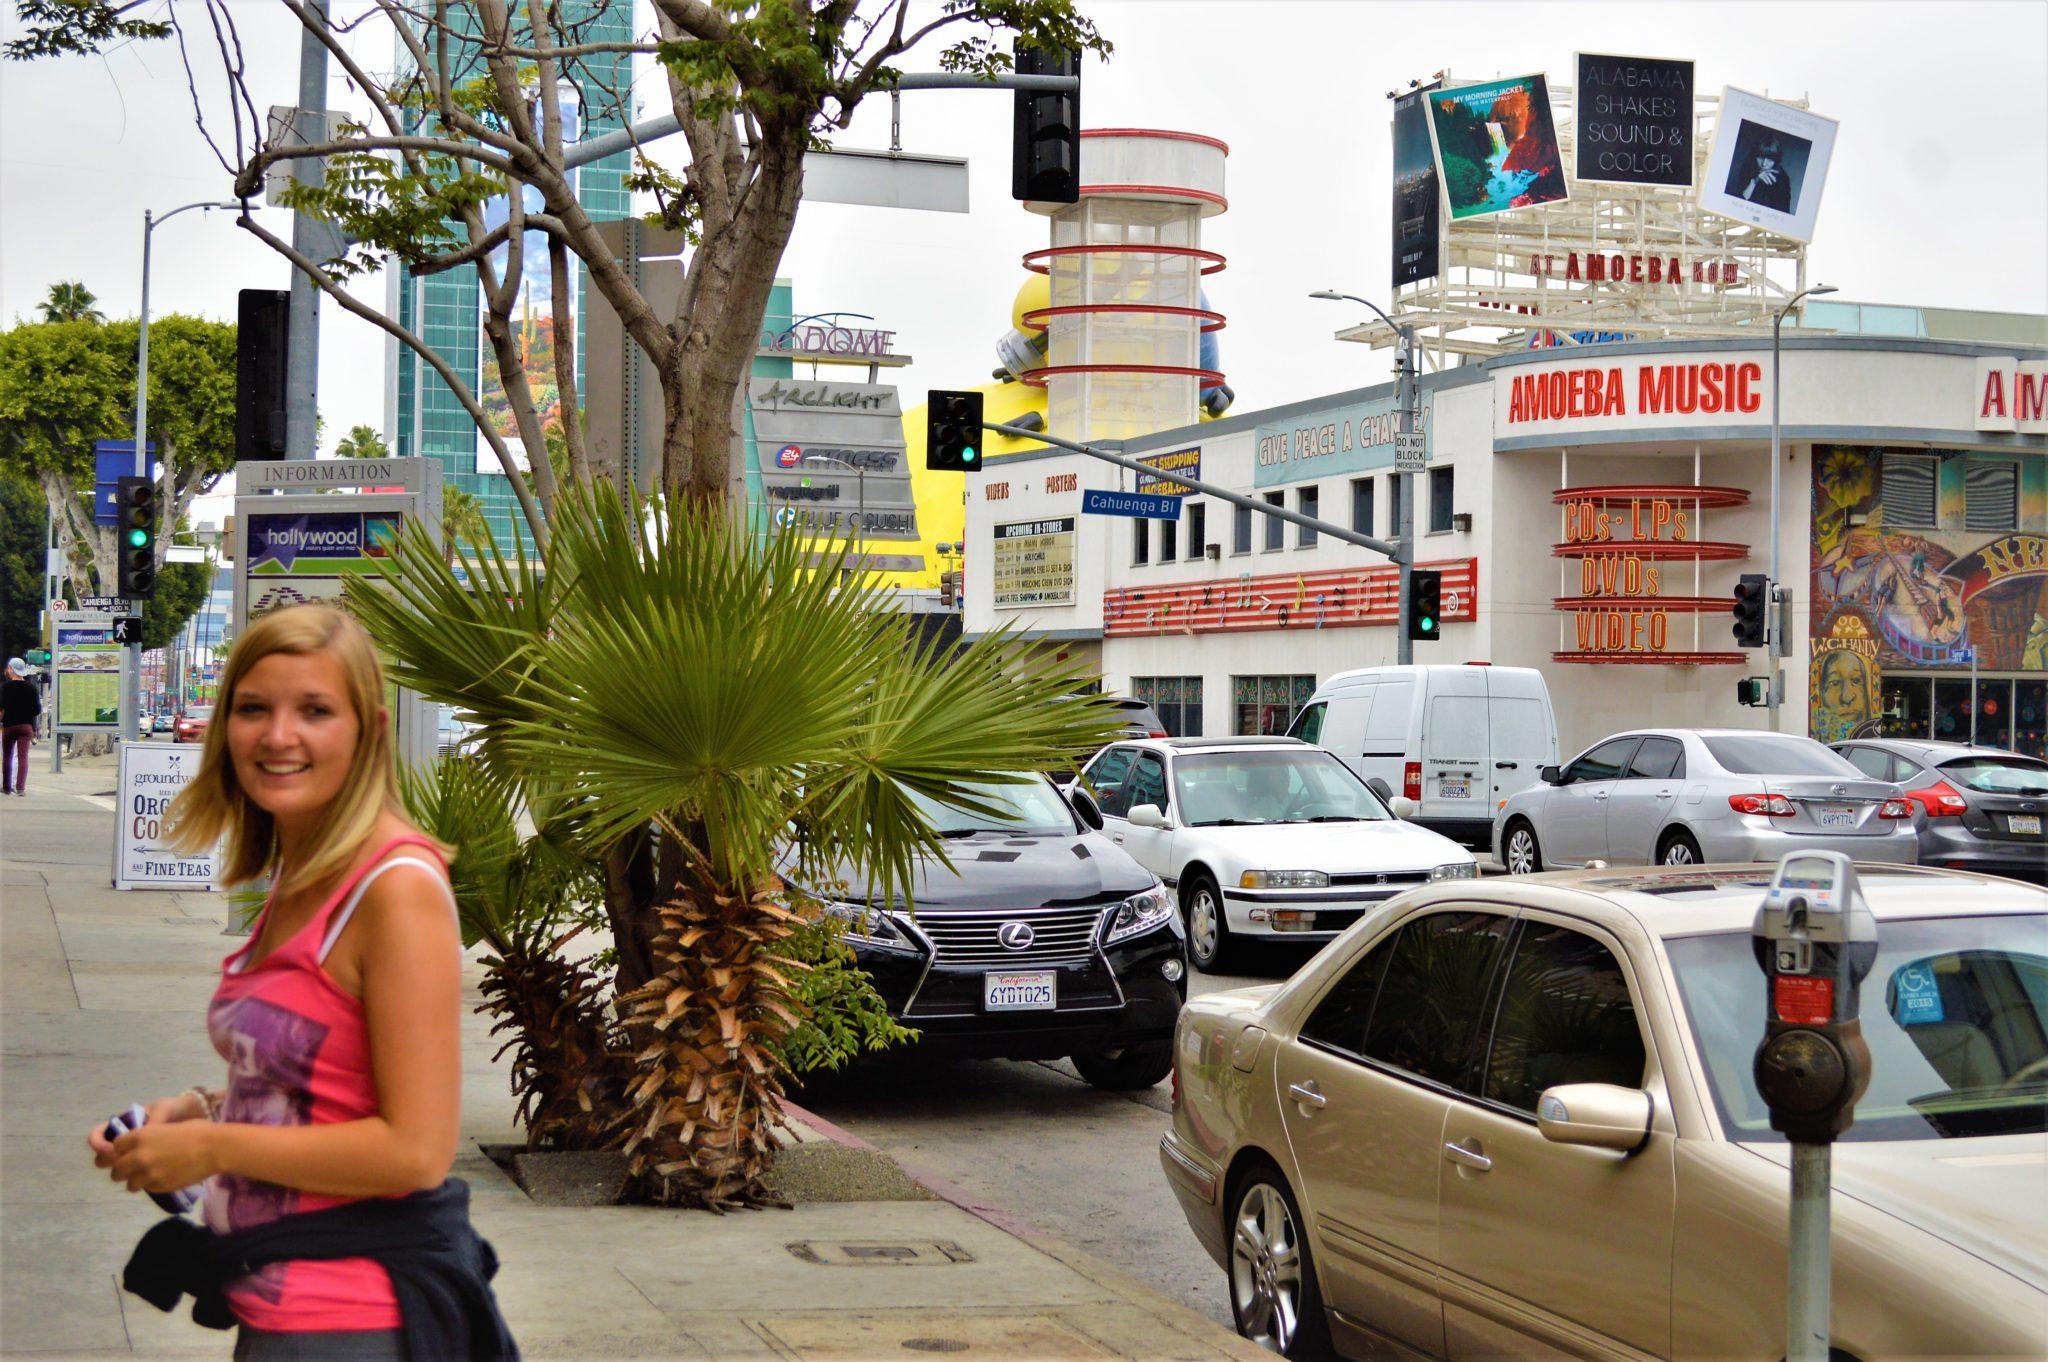 Amoeba Music, Hollywood, things to see Los Angeles, California